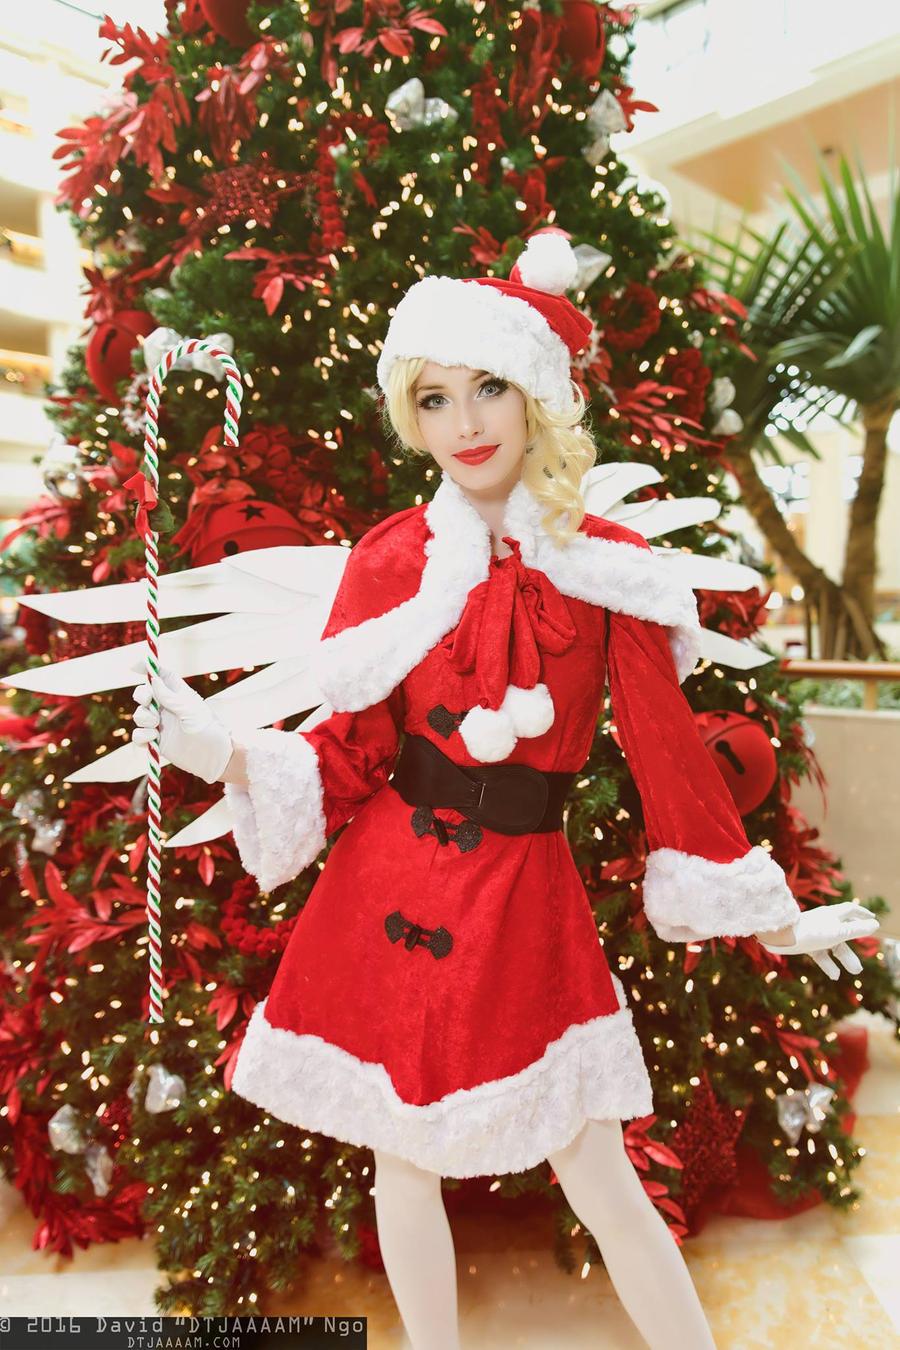 Holiday Mercy - Candycane by MeganCoffey